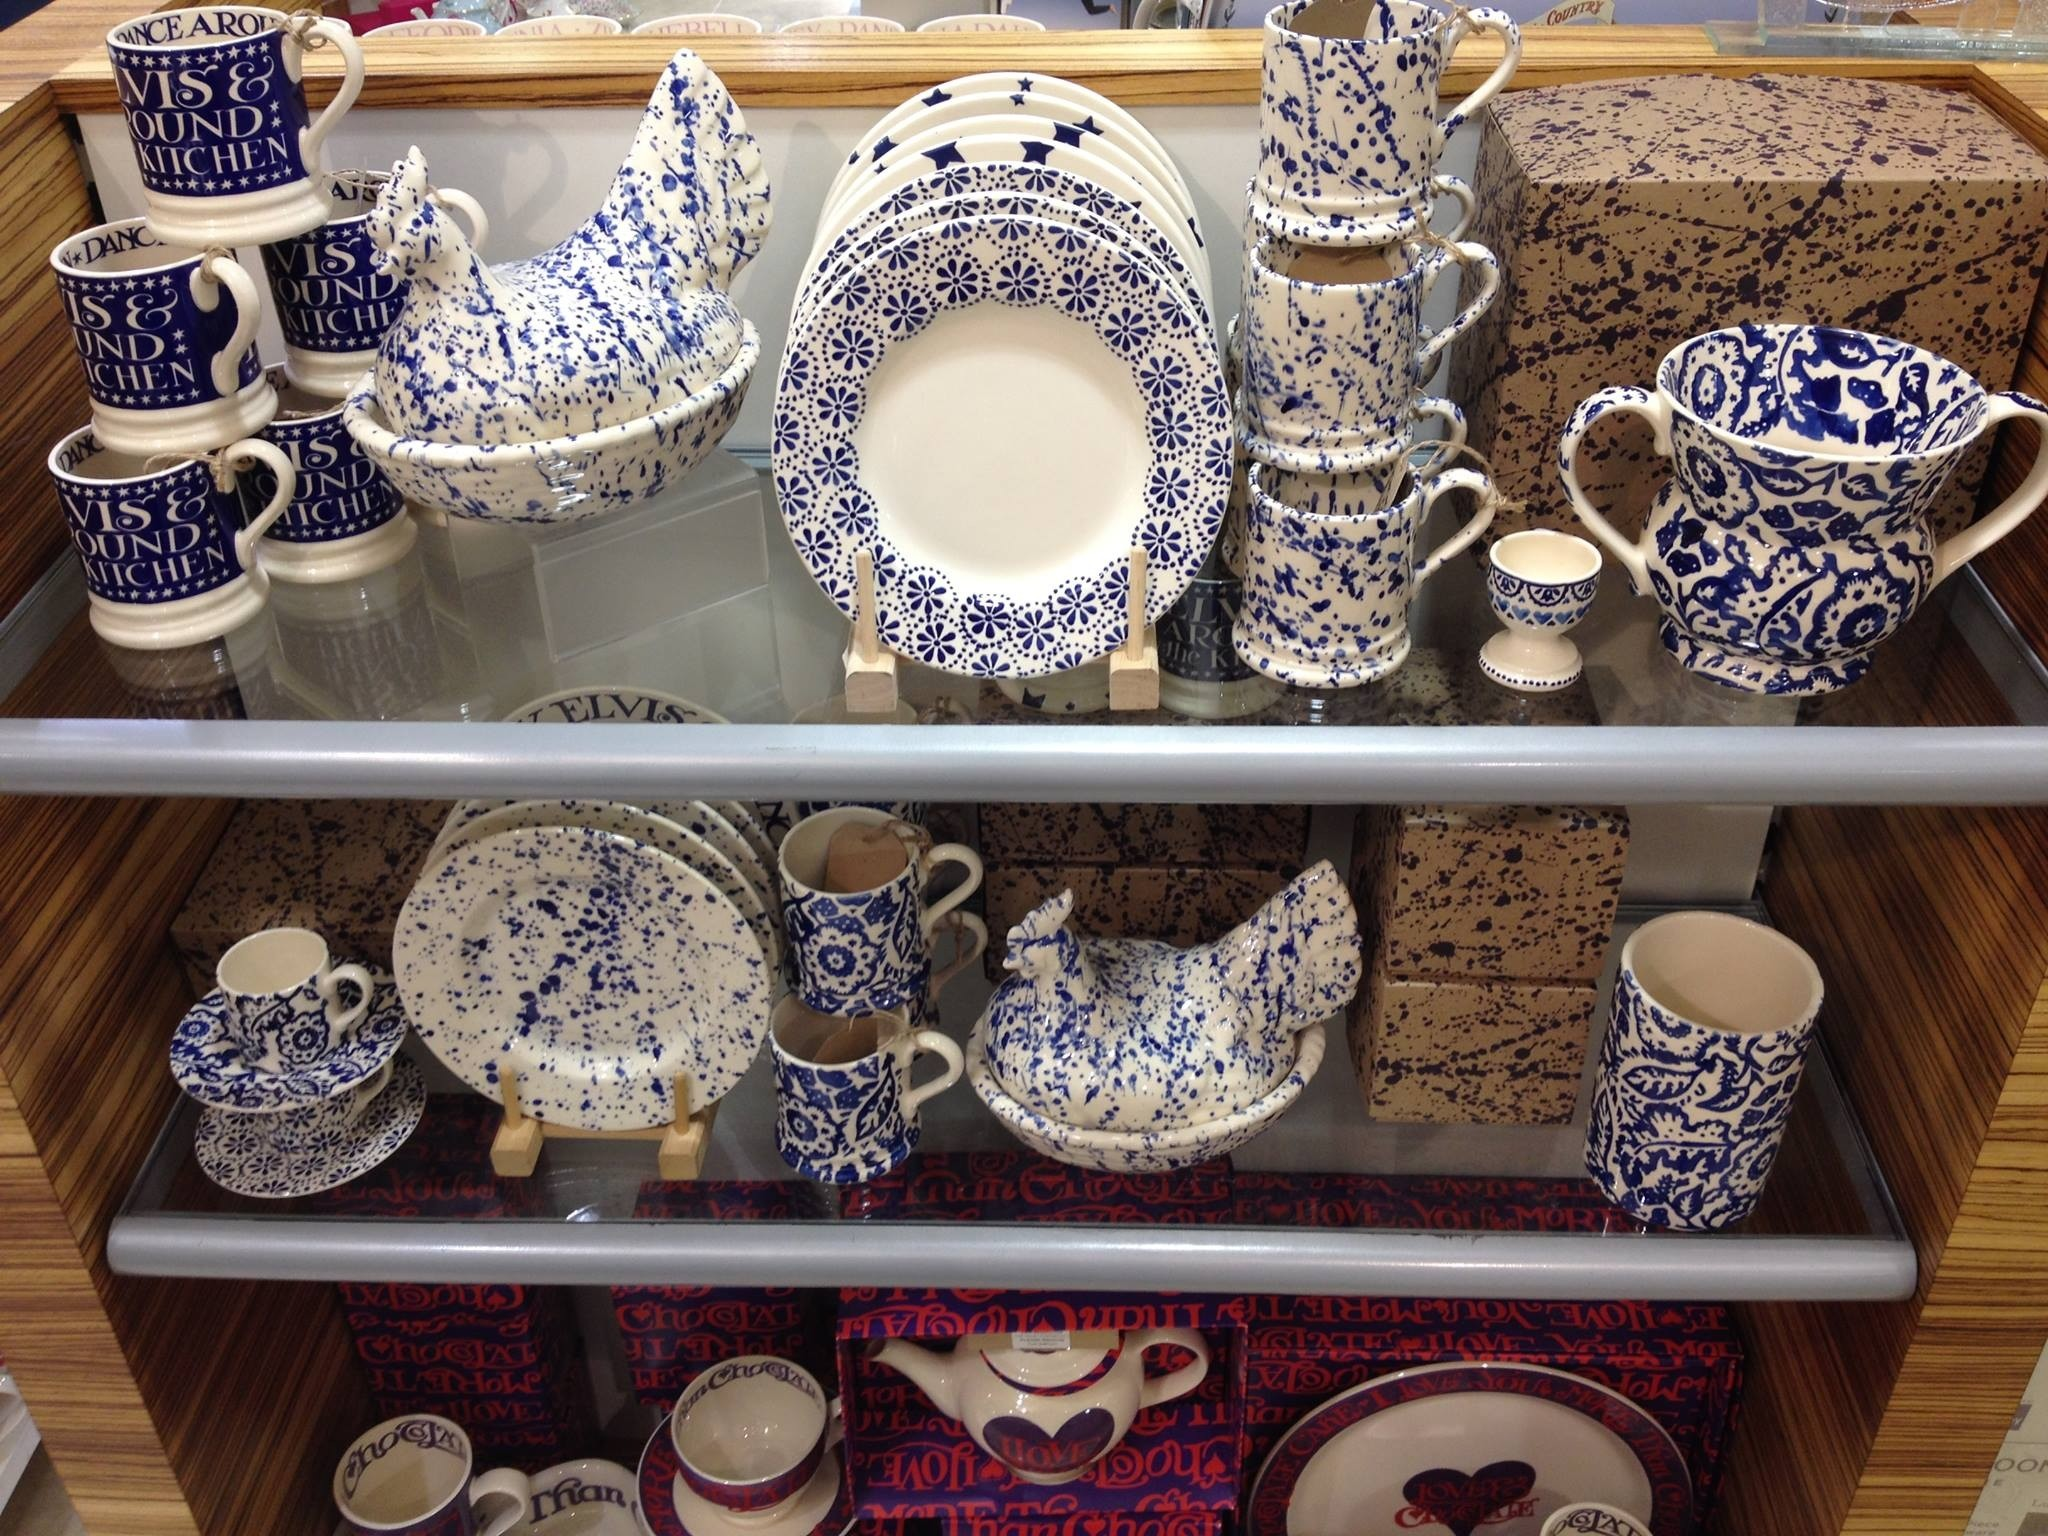 Emma Bridgewater Blue Wallpaper Two Handled Vase, Medium Vase, 0.5 Pint Mug  and Espresso